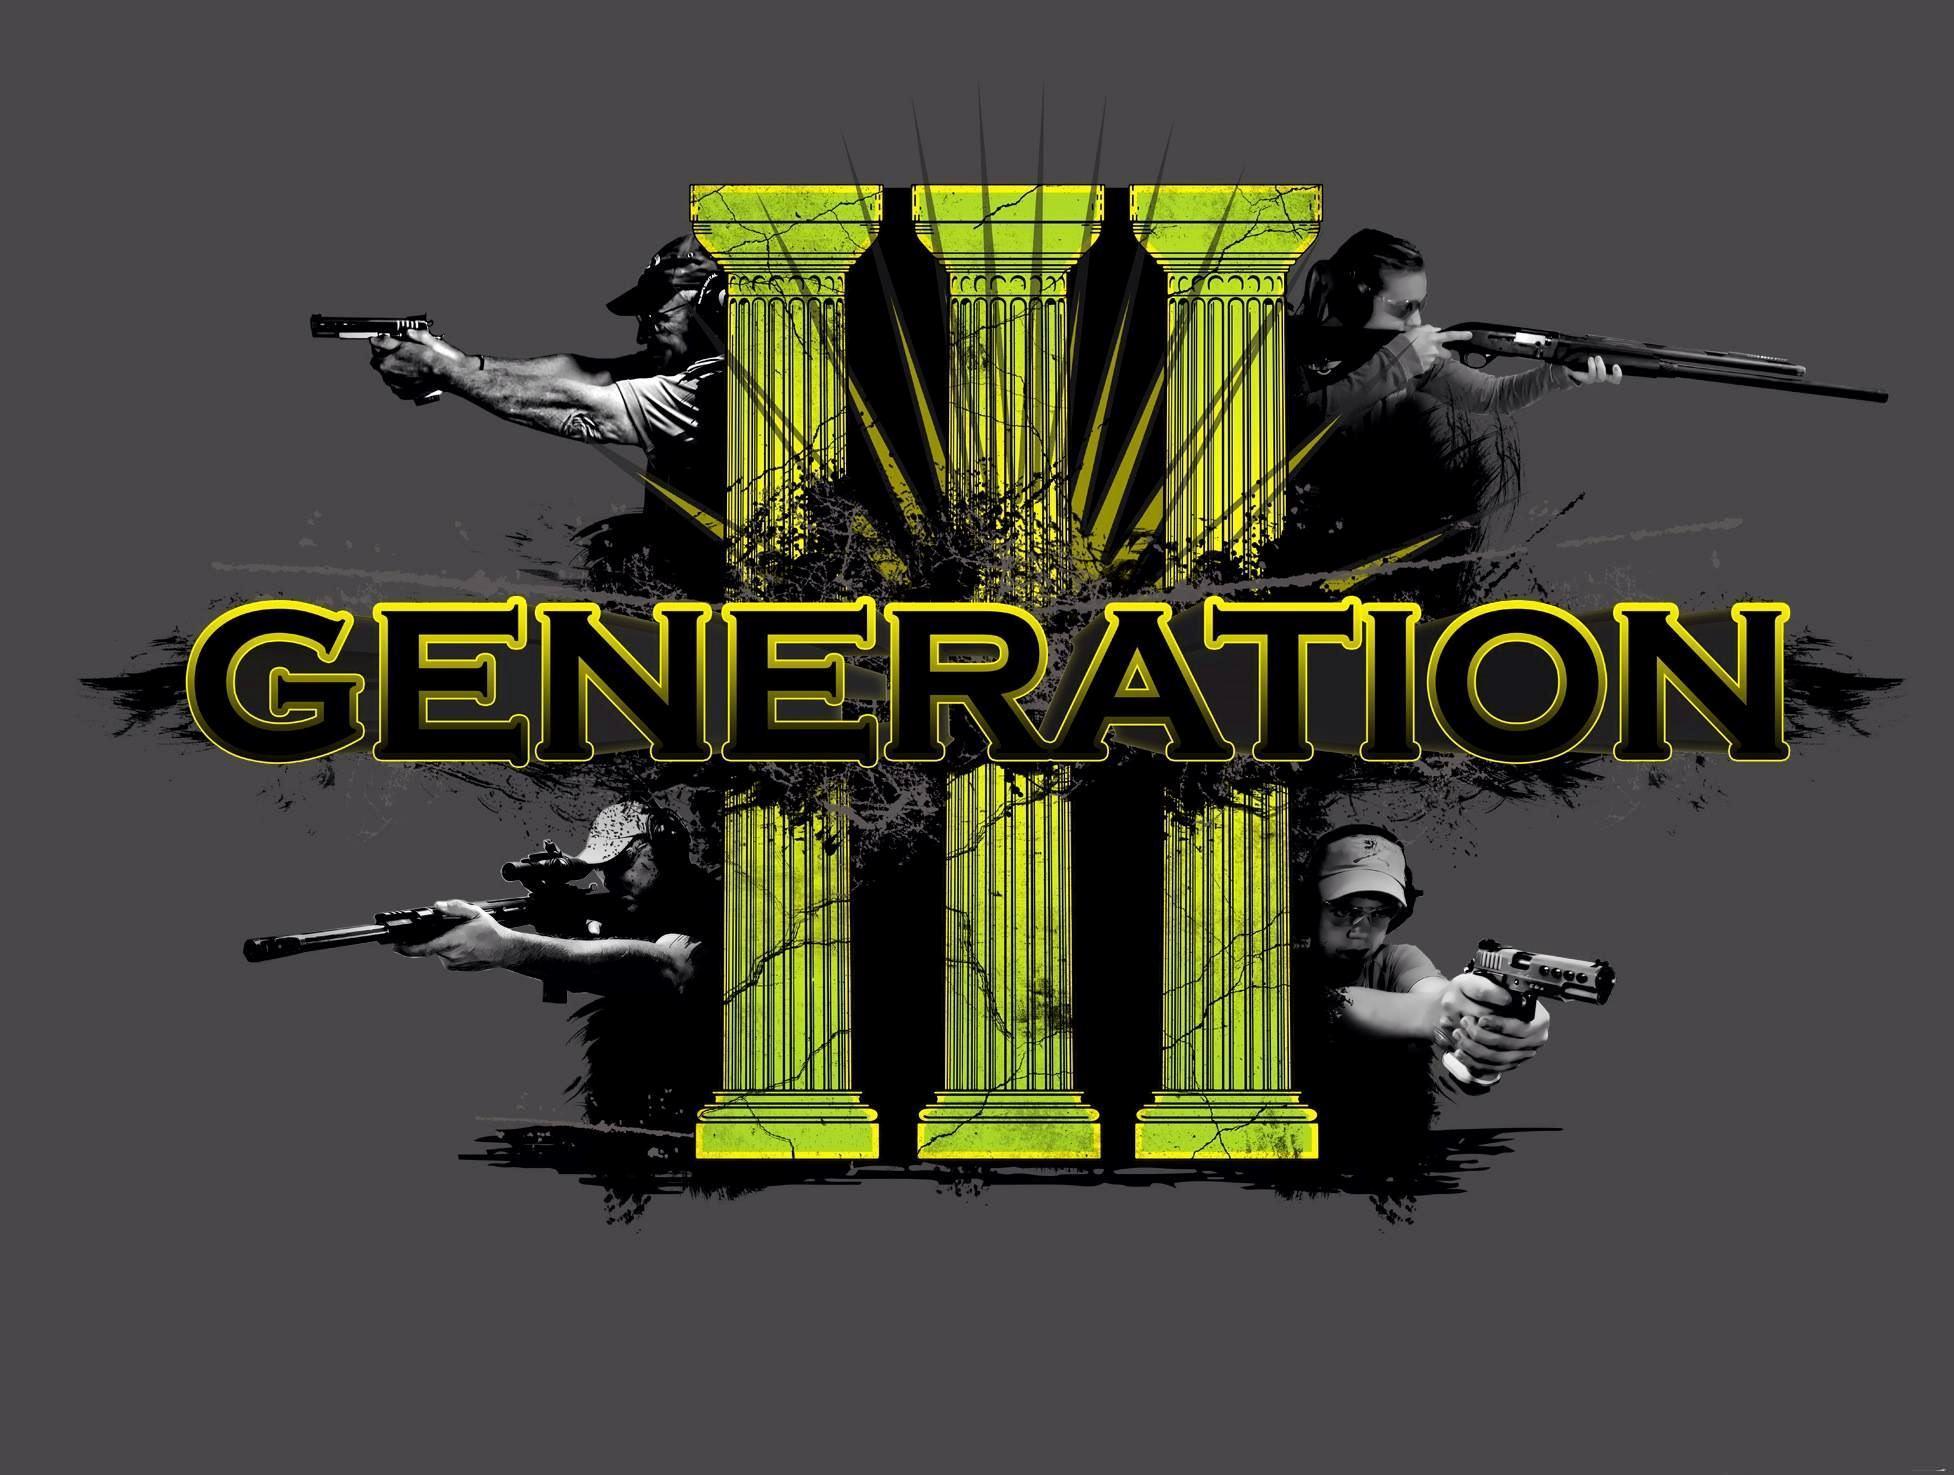 Generation III Gun